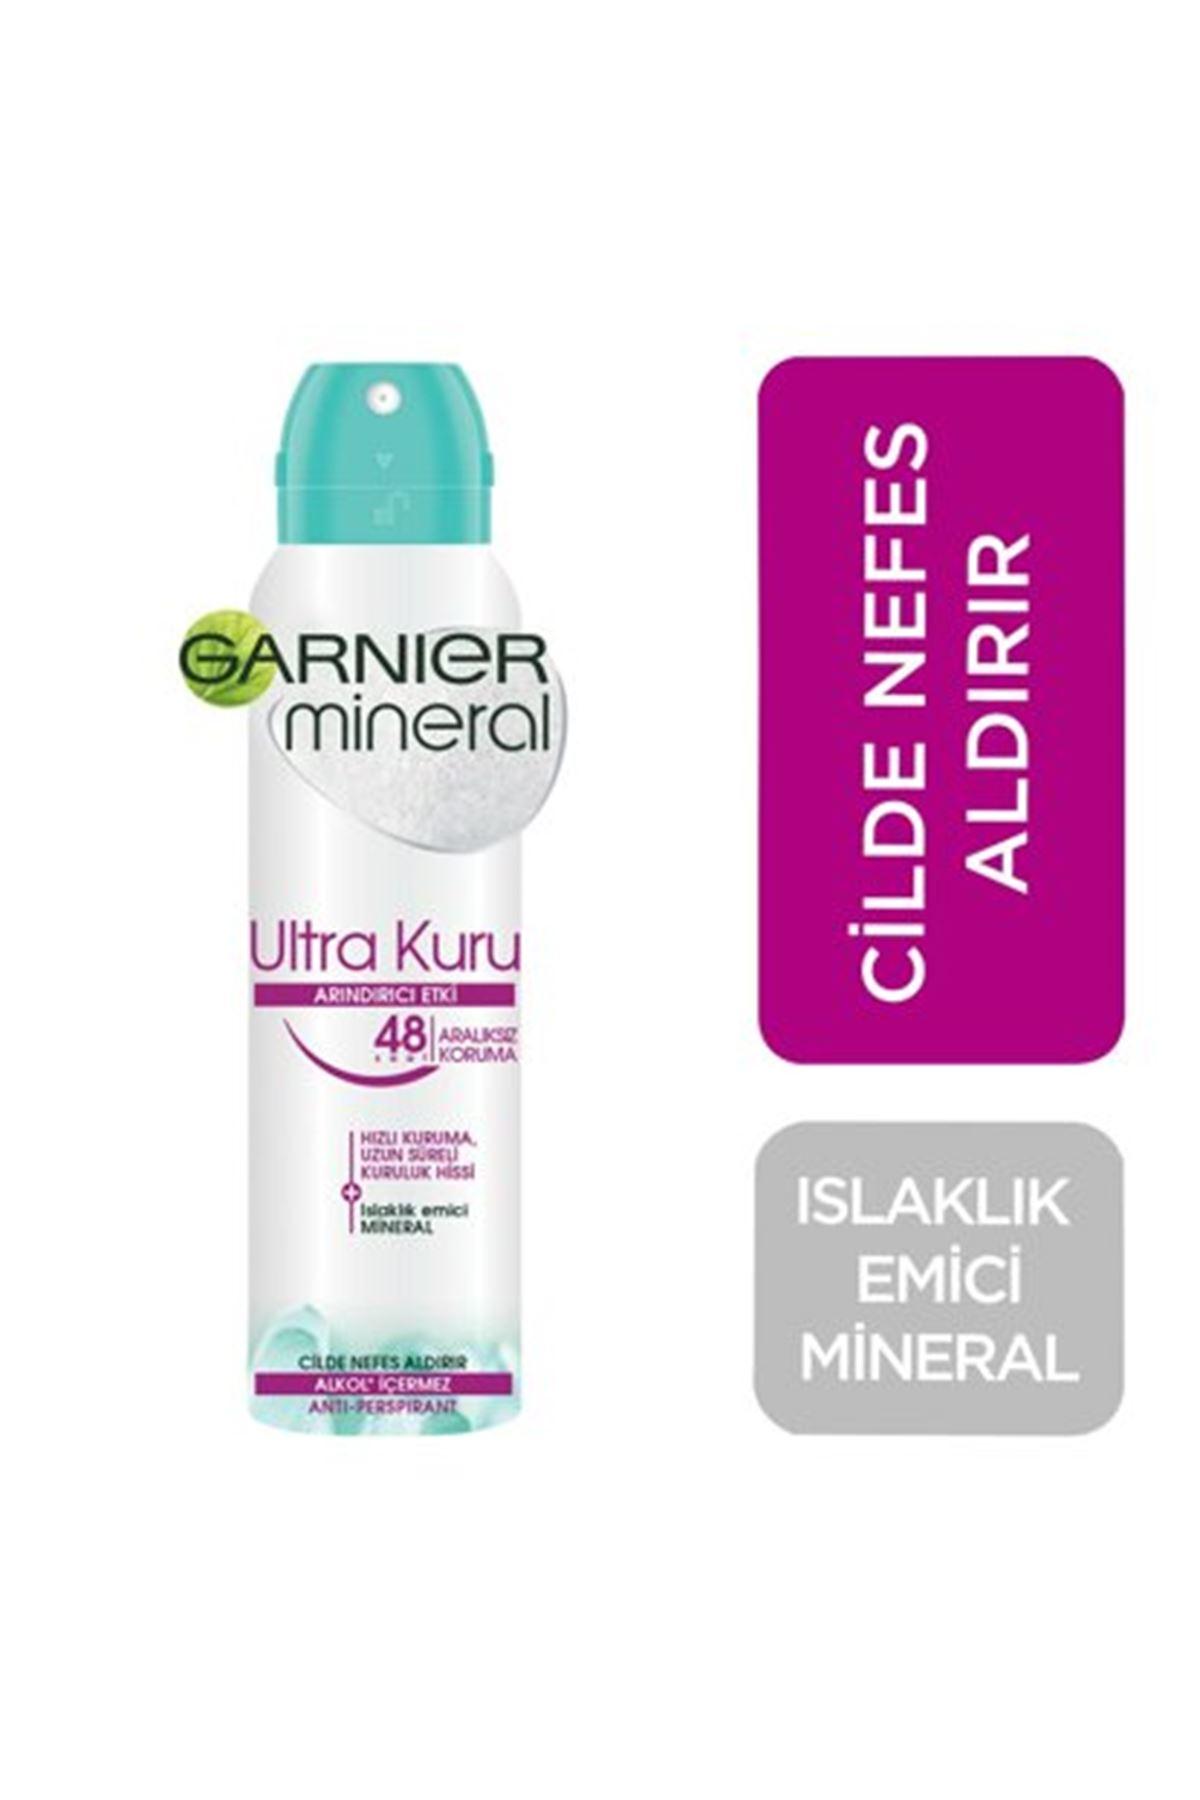 Garnier Mineral Deodorant Ultra Kuru Hızlı Kuruma 150 ml